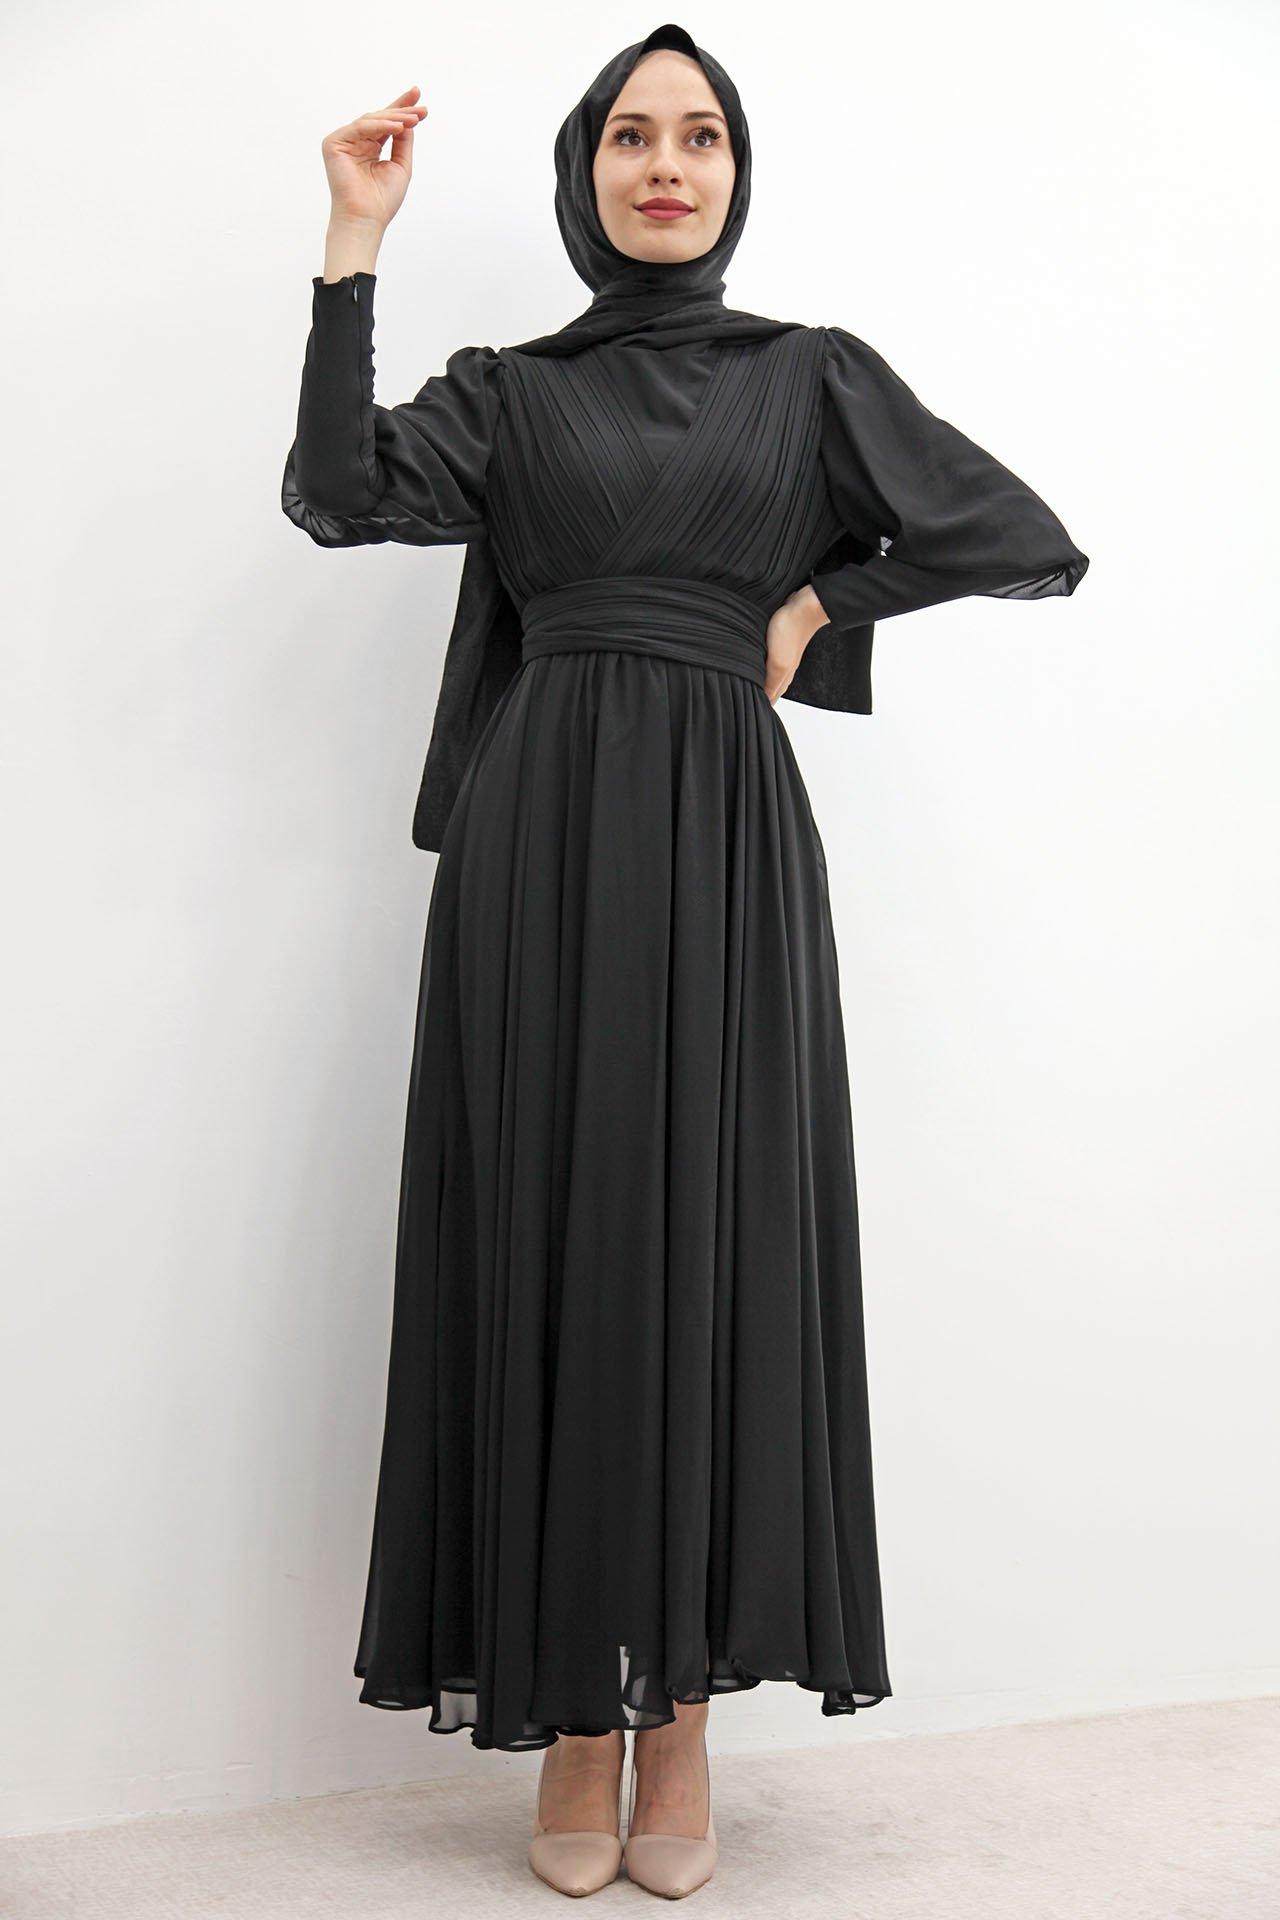 GİZAGİYİM - Kol Manşetli Piliseli Elbise Siyah